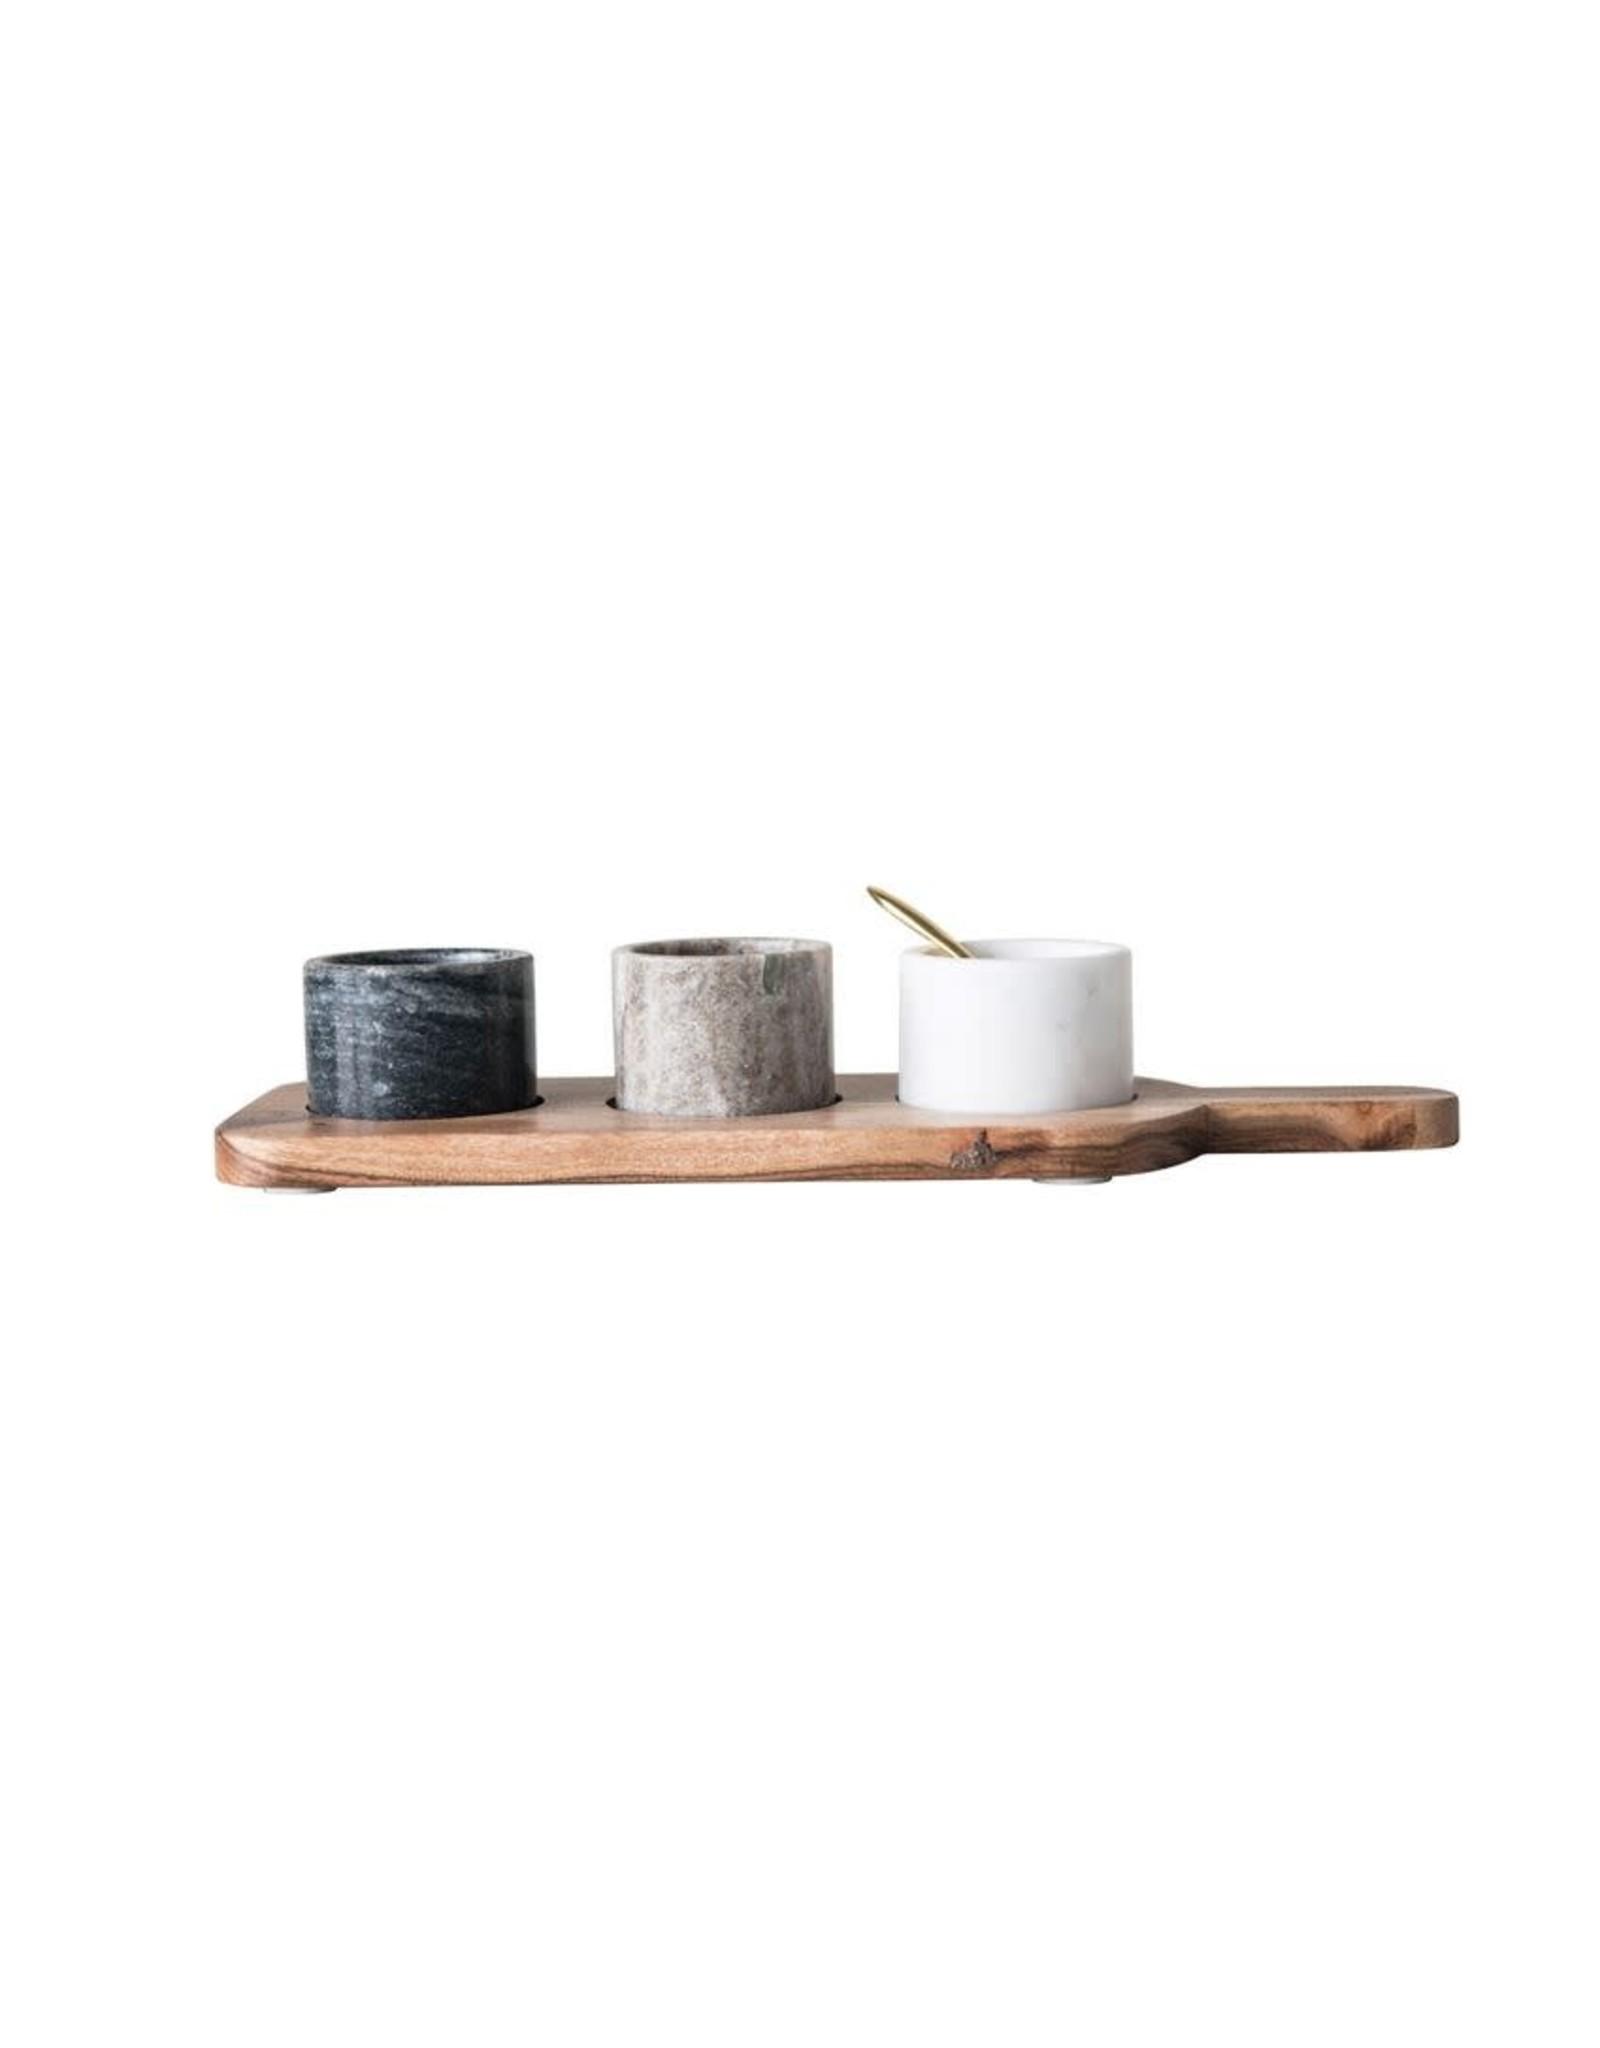 Website Acacia Wood Board w/ 3 Marble Pinch Pots & Brass Spoon, Set of 5